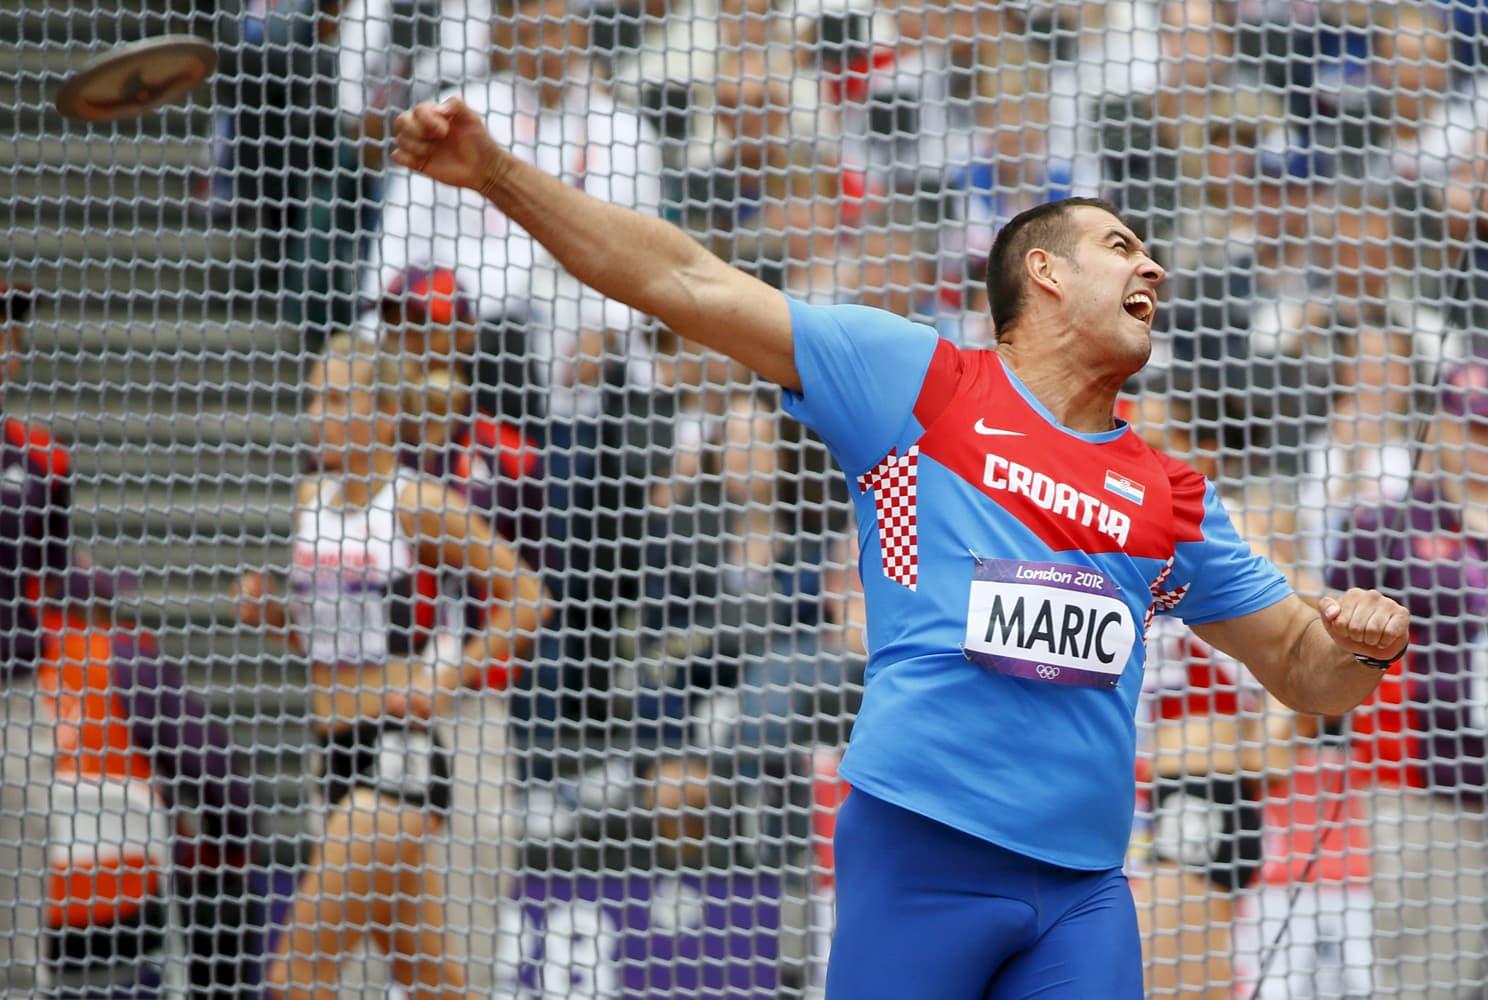 Martin Maric